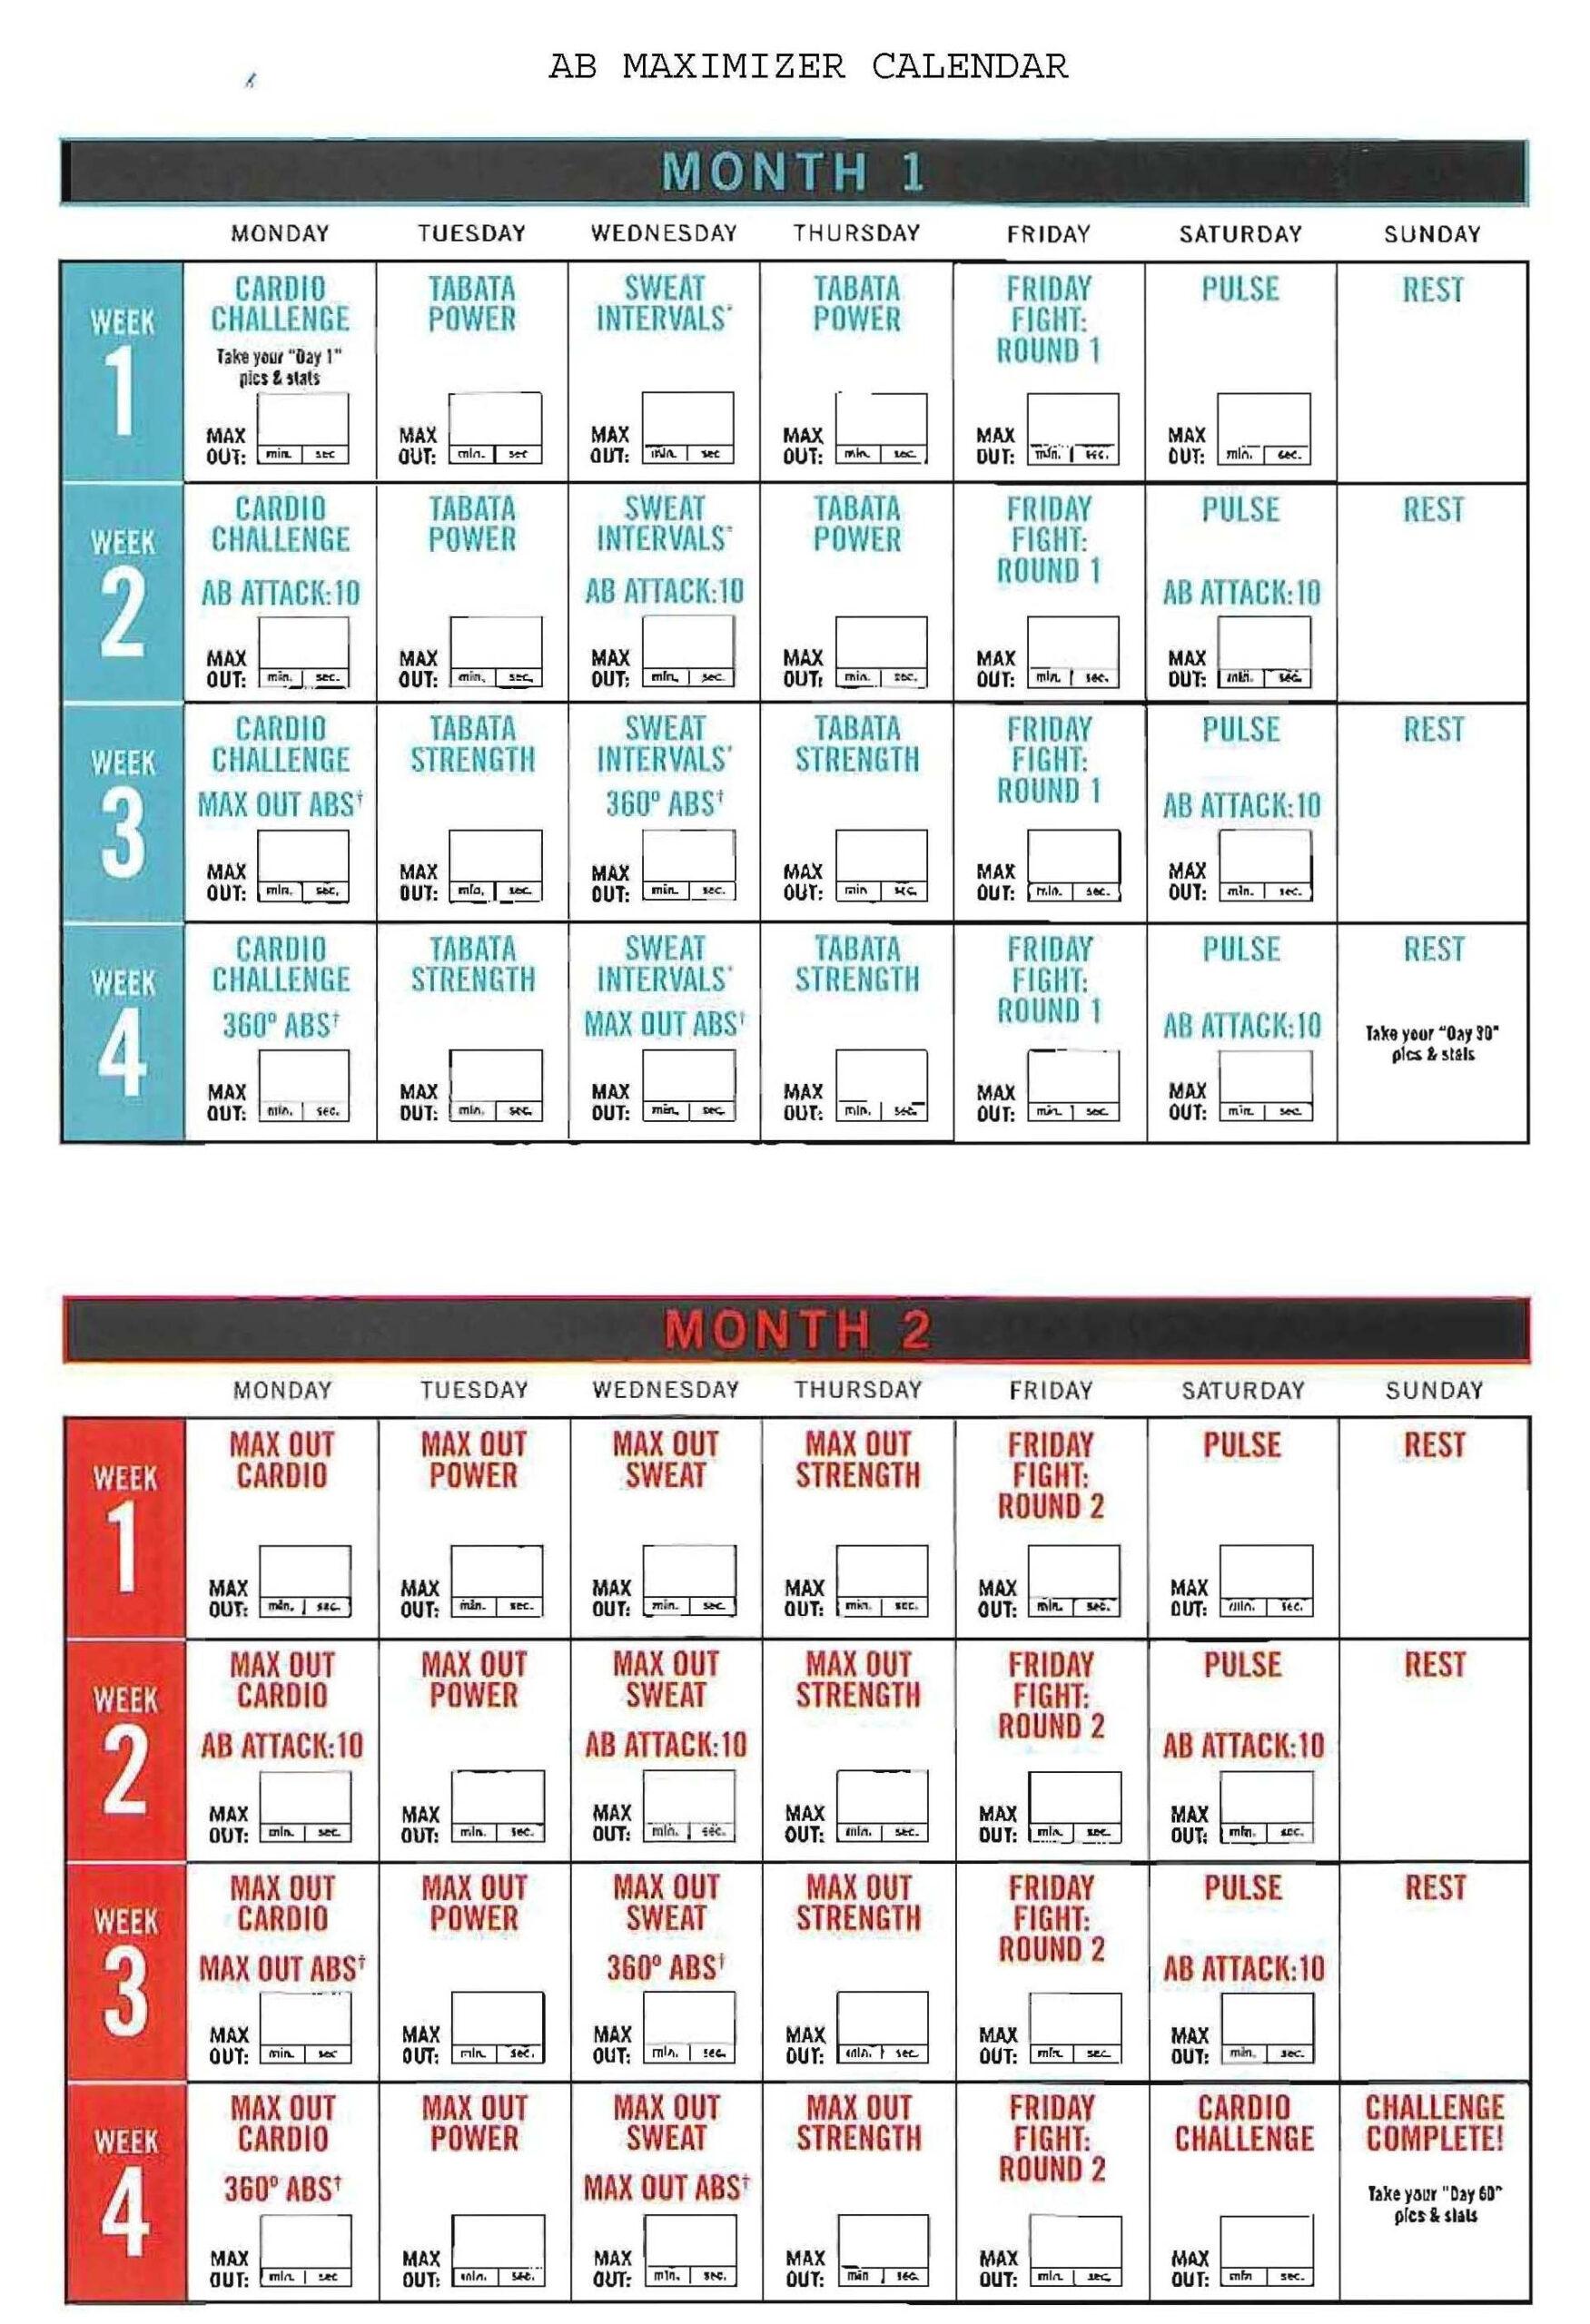 Insanity Ab Maximizer Calendar! Hit Tha Floor  Starting 12 pertaining to Calendario Insanity Max 30